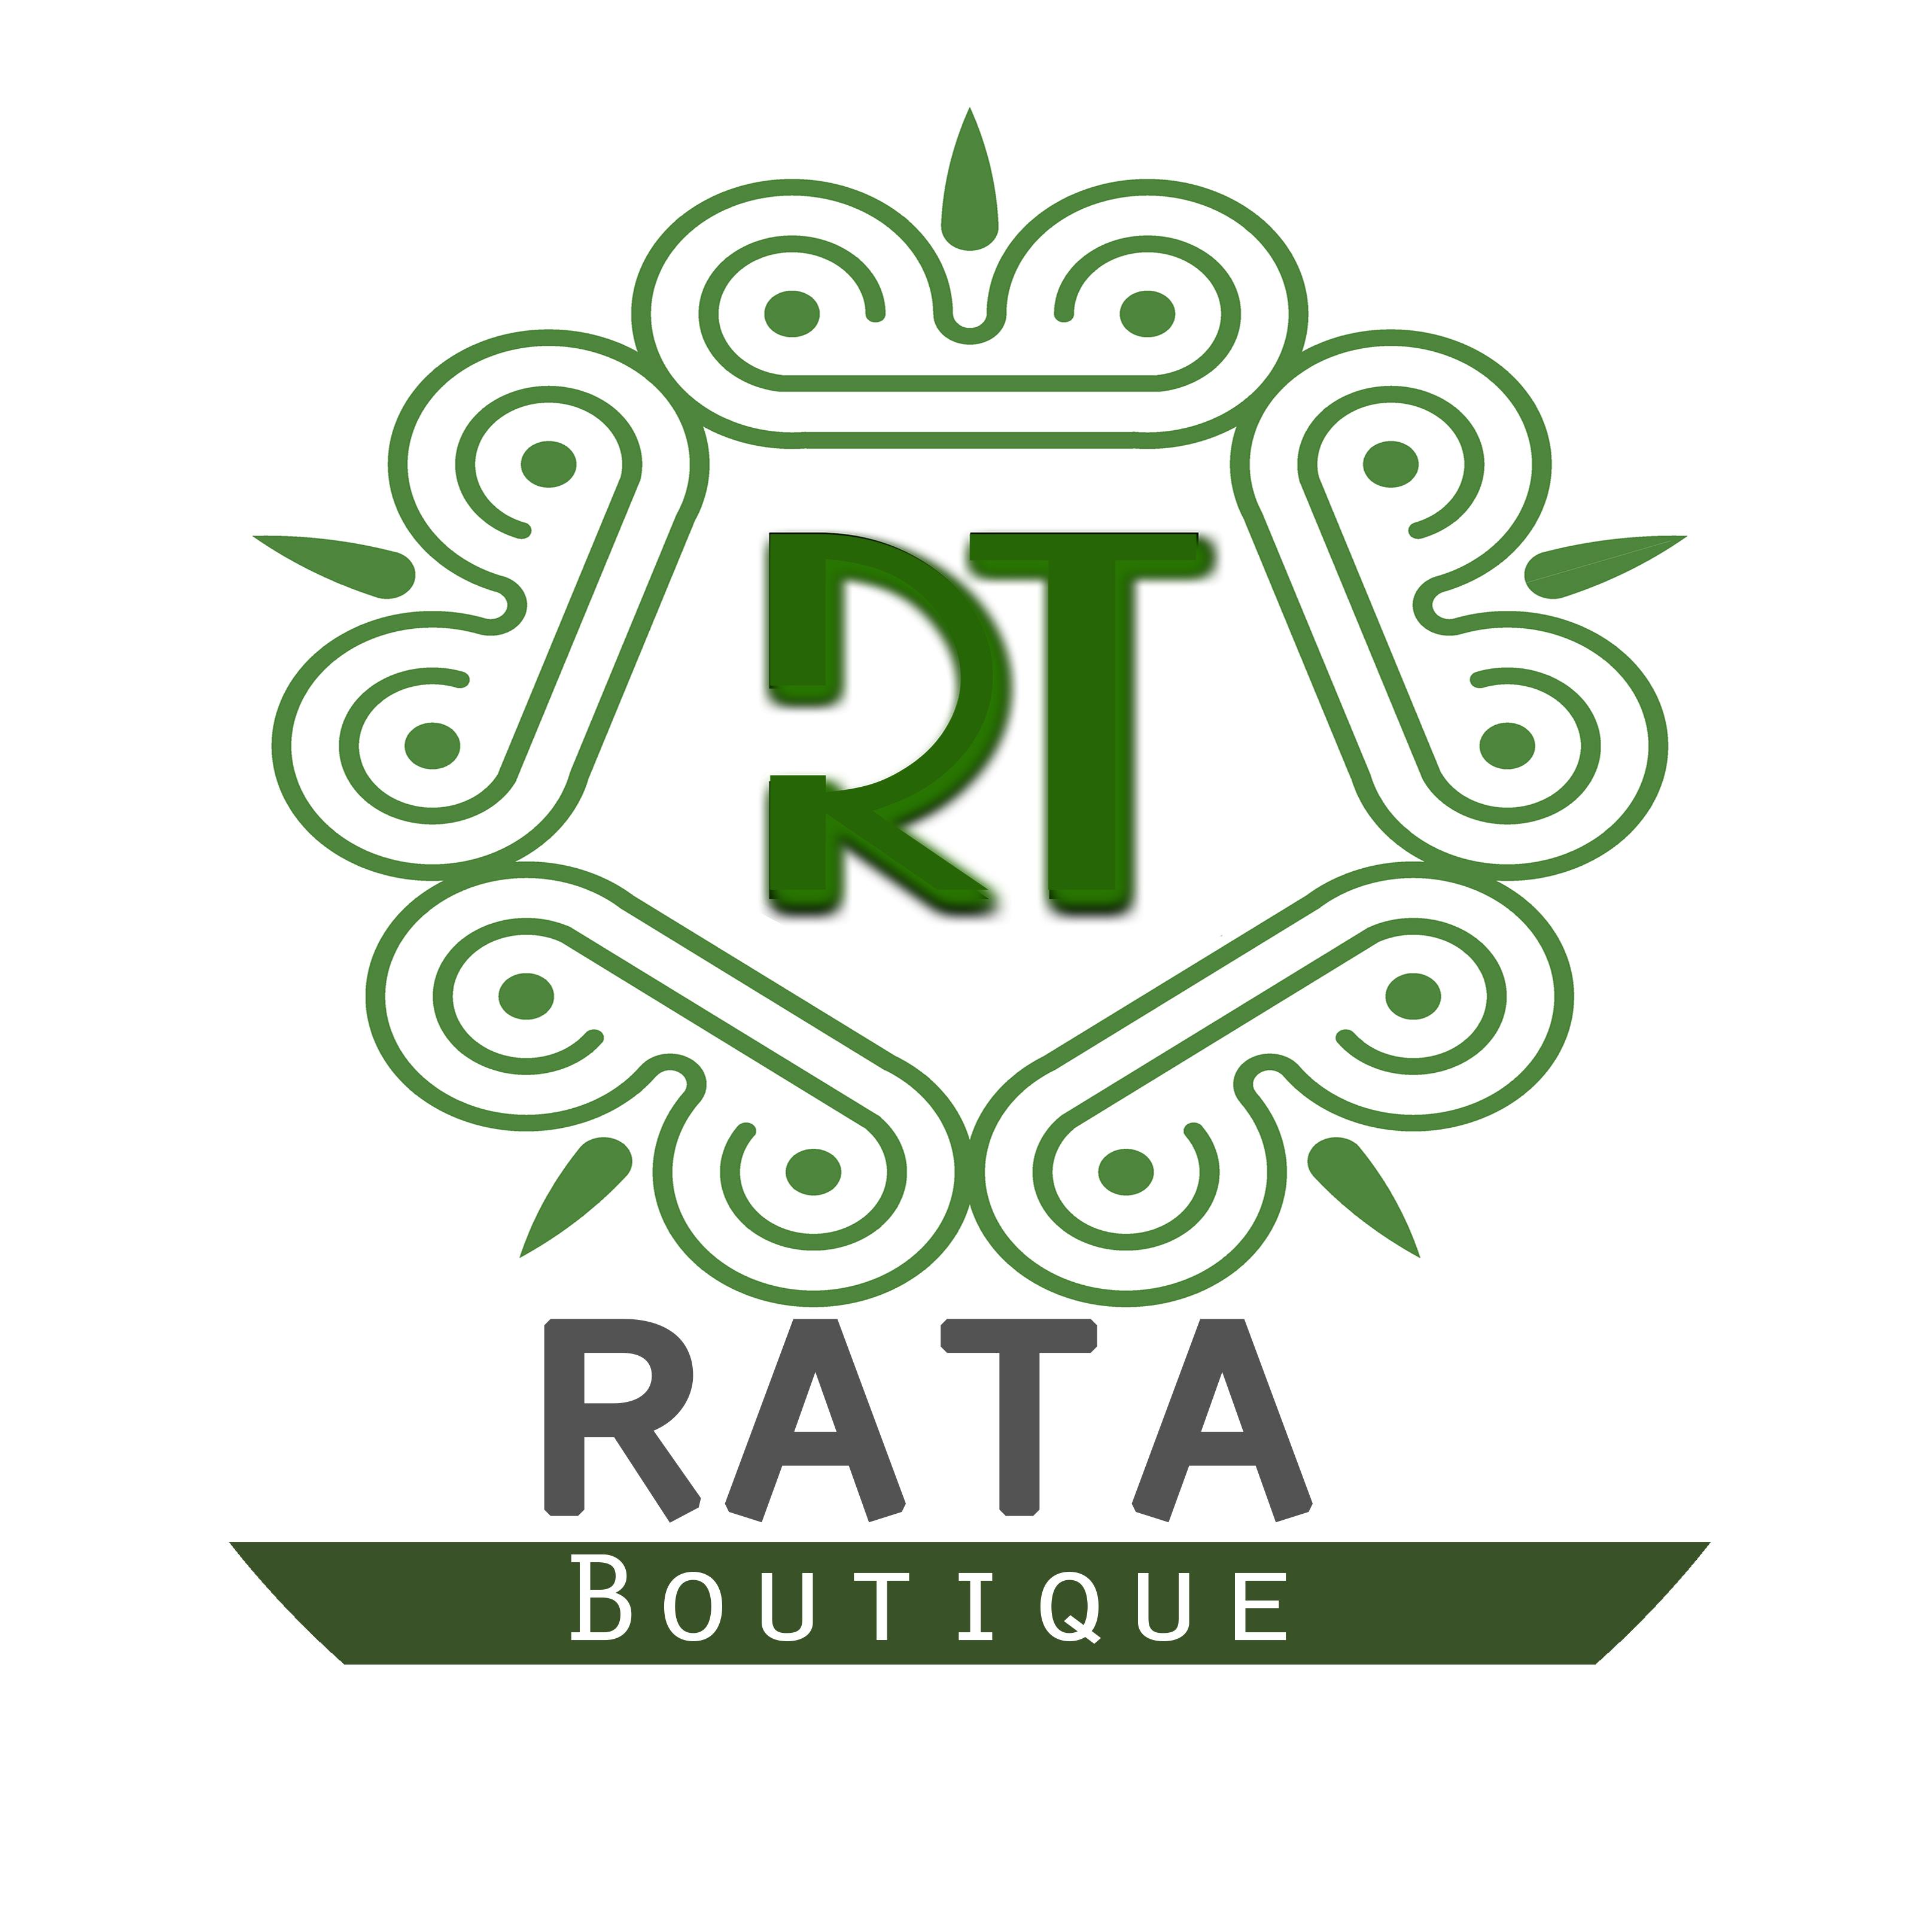 RATA Boutique Hotel